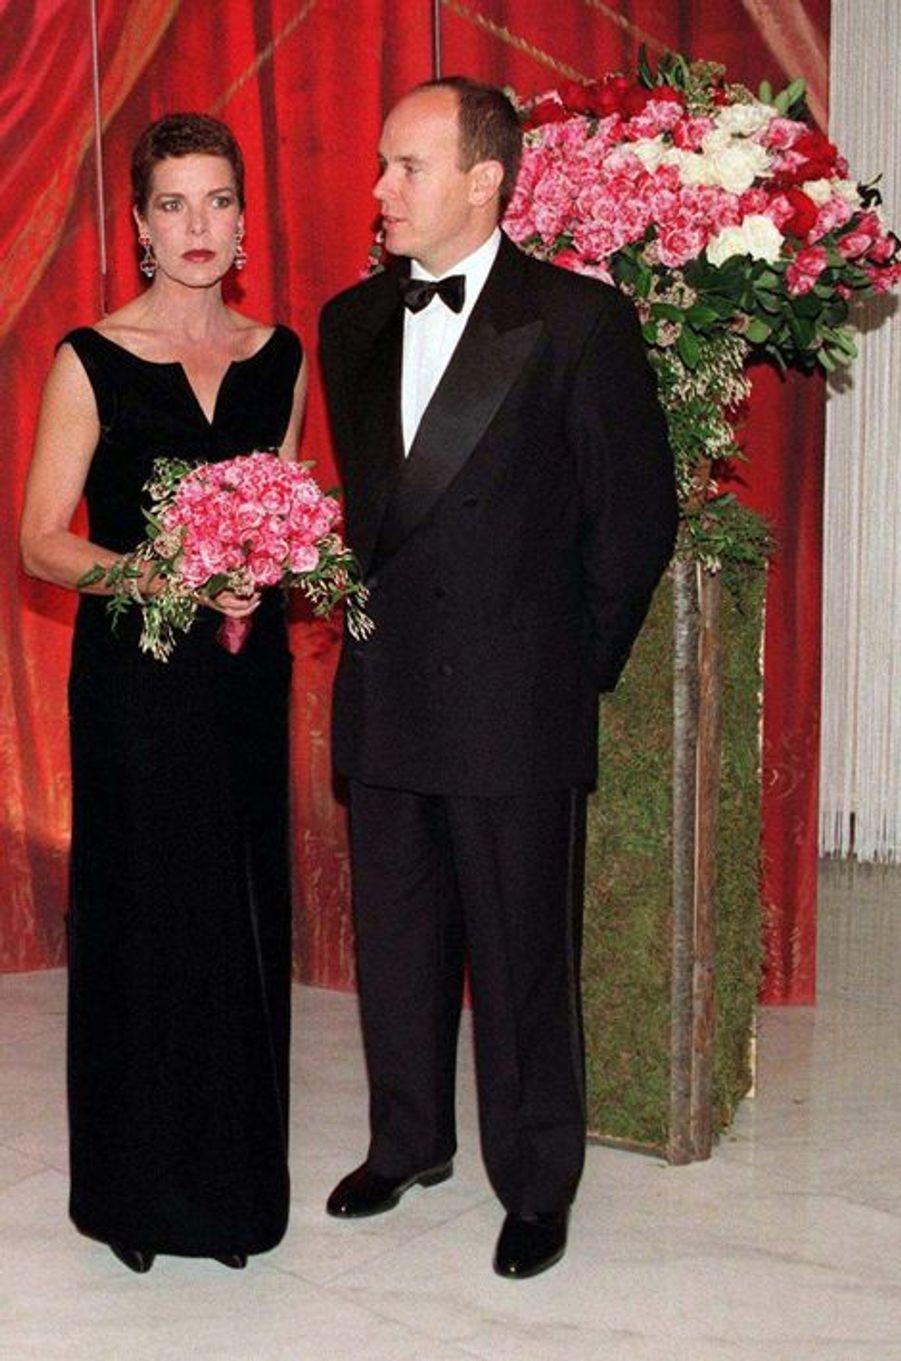 La princesse Caroline de Monaco au bal de la Rose 1997, avec le prince Albert